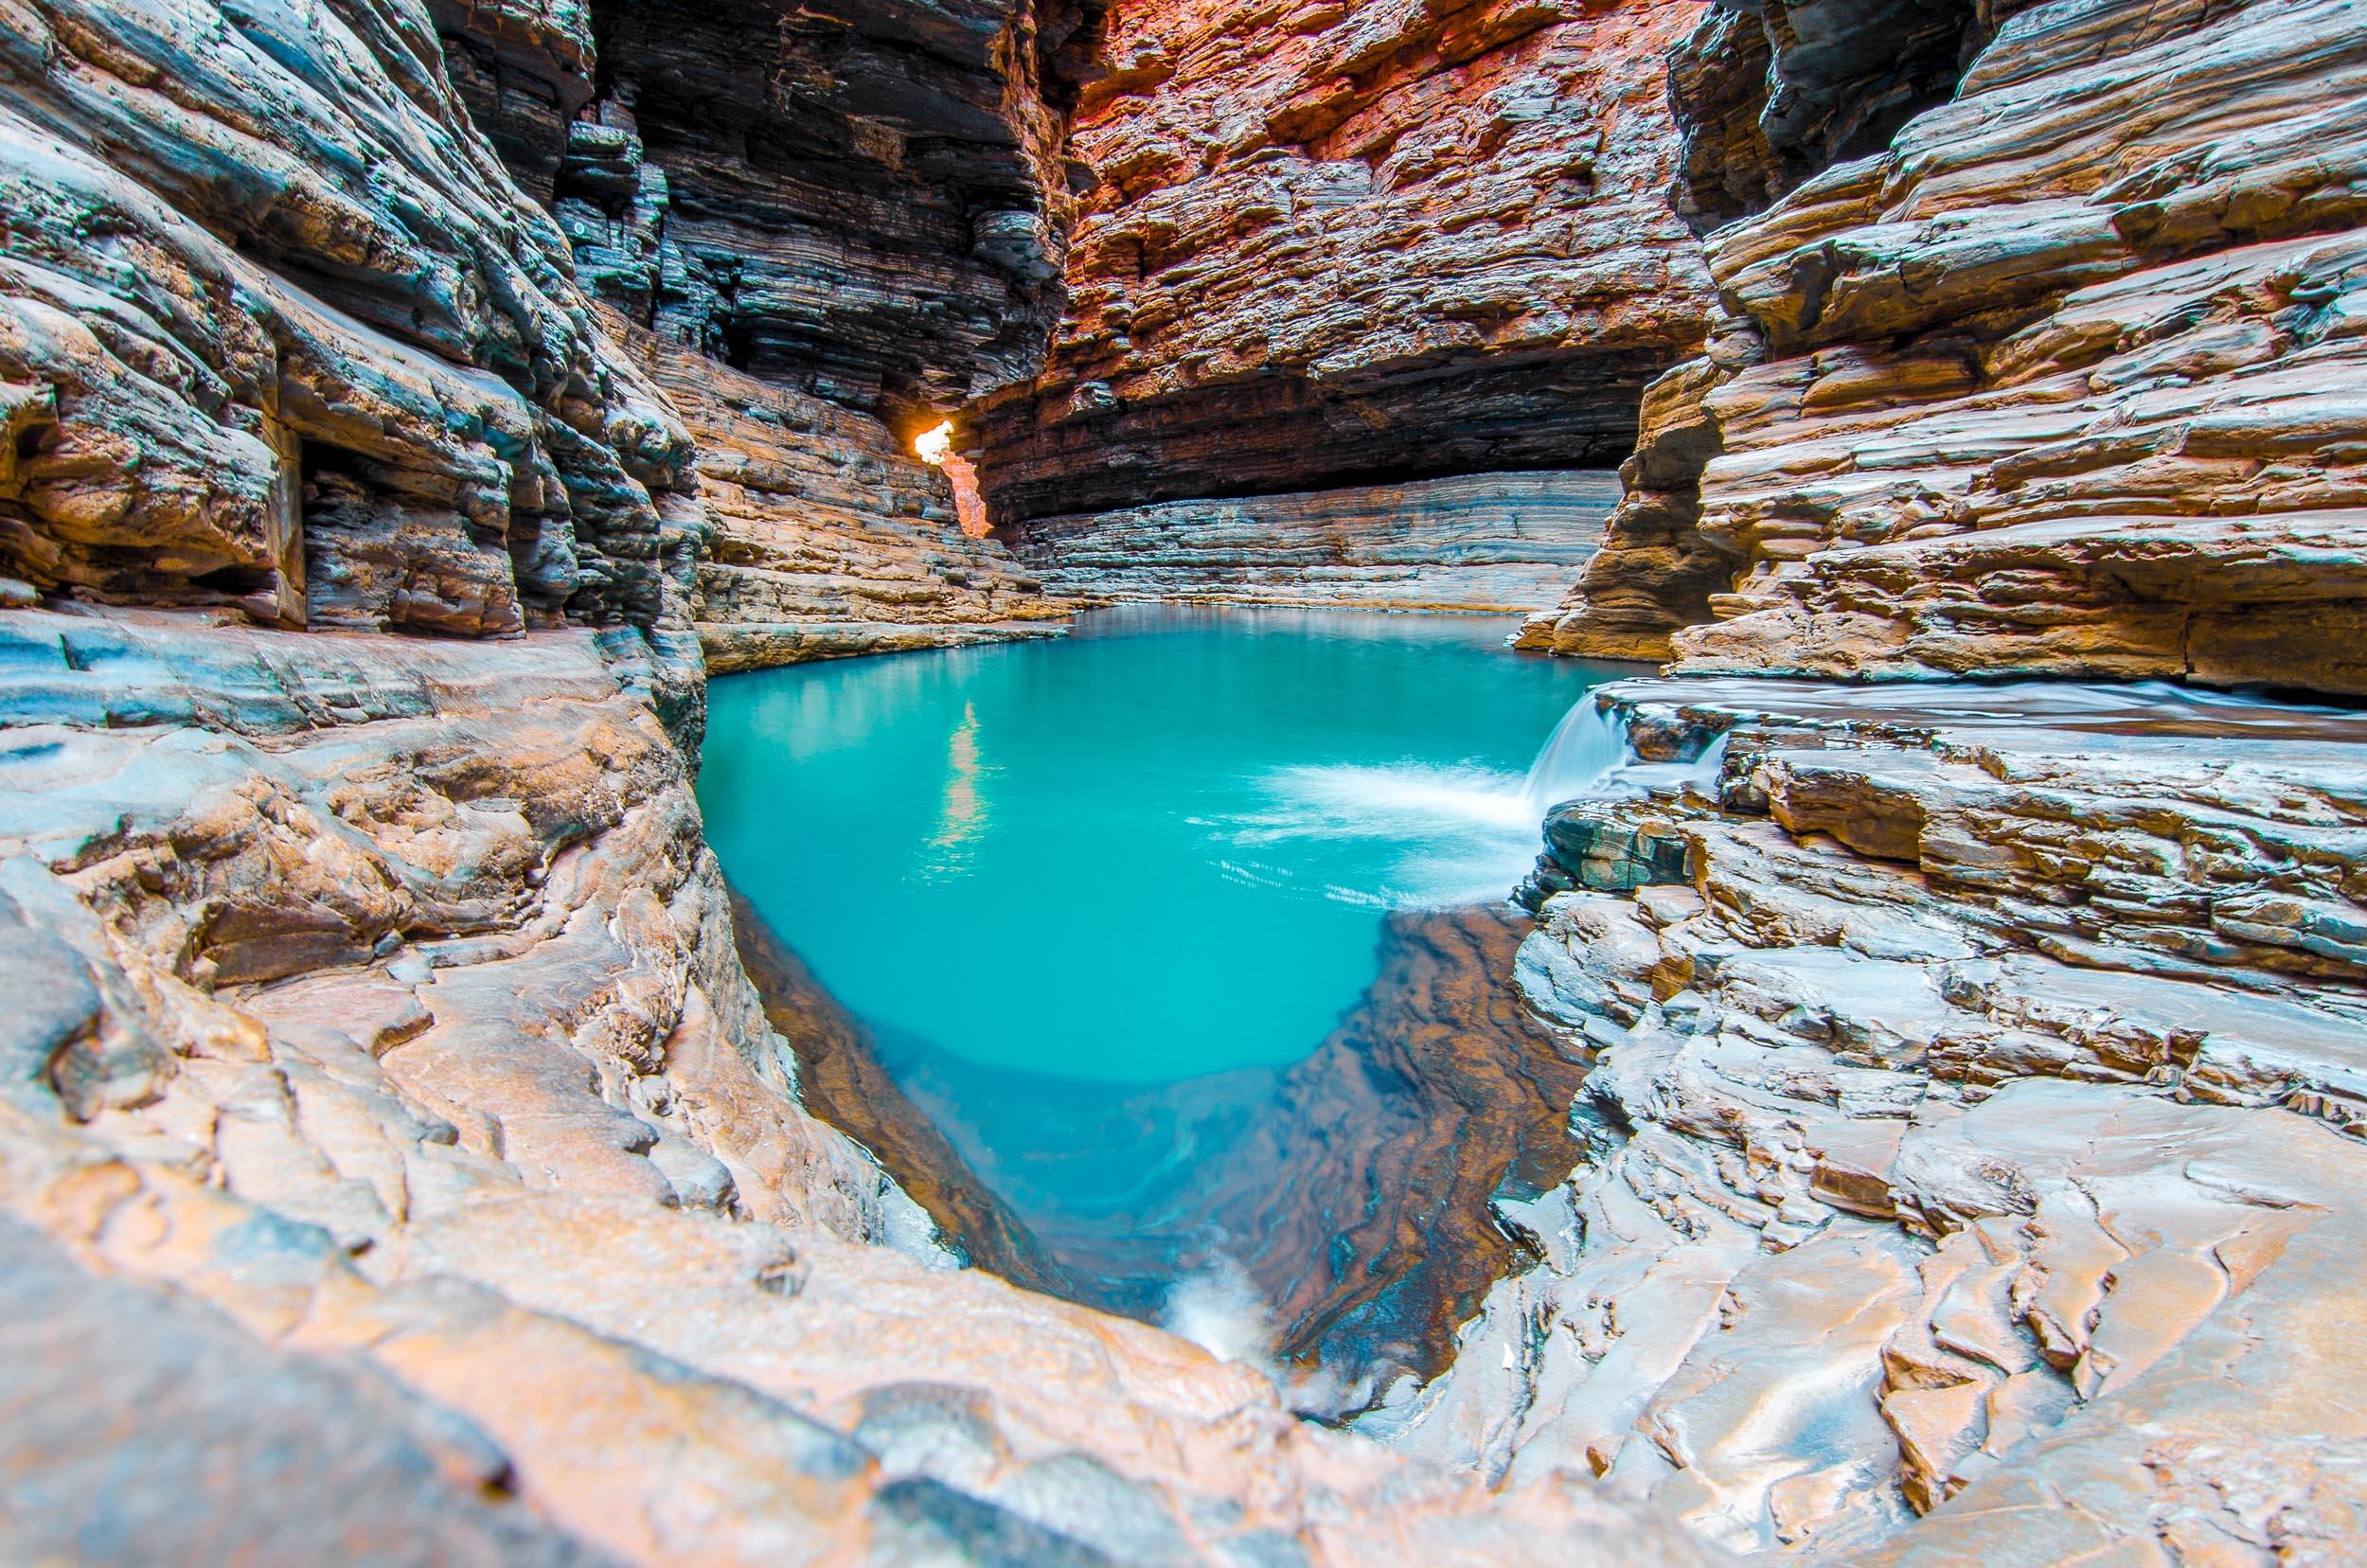 kermits pool karijini côte ouest australie